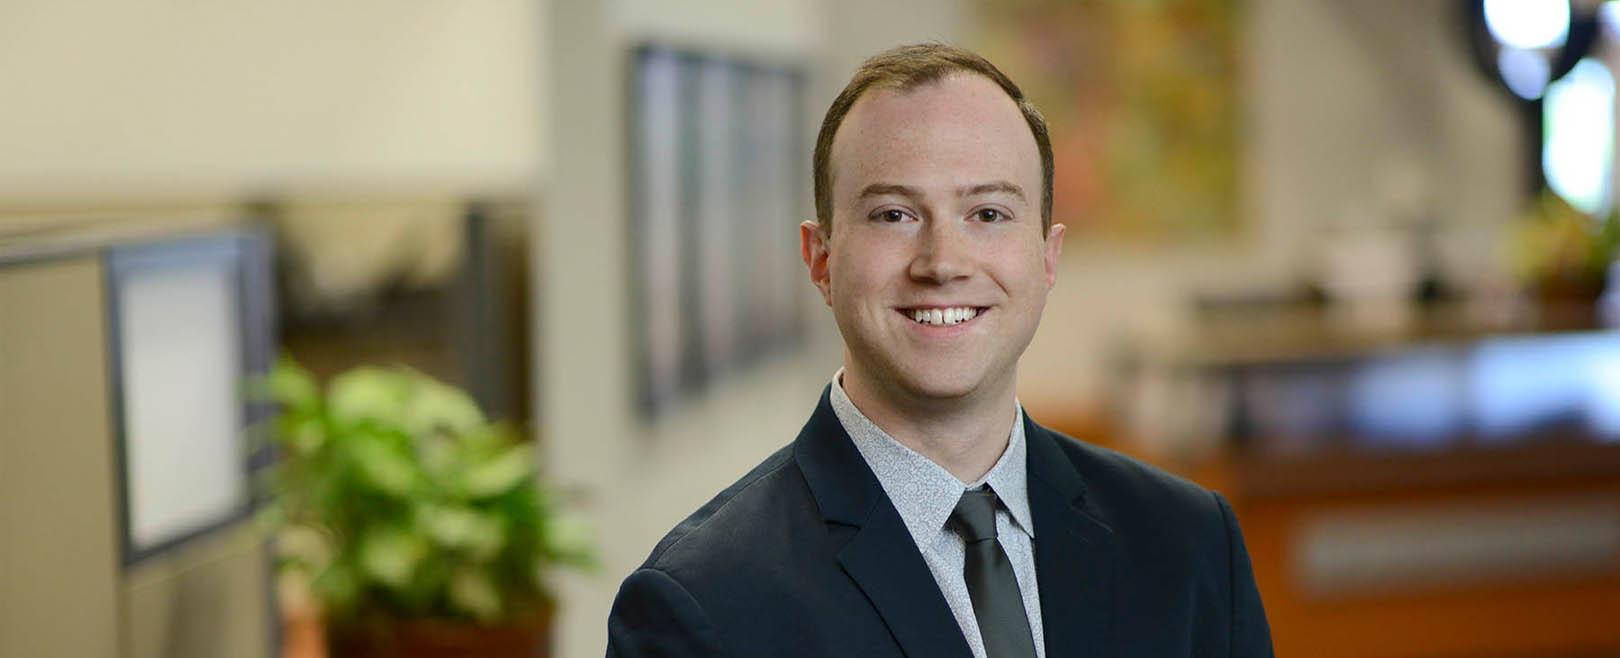 Ian Cerminara, CFP, Financial Planner Pittsburgh